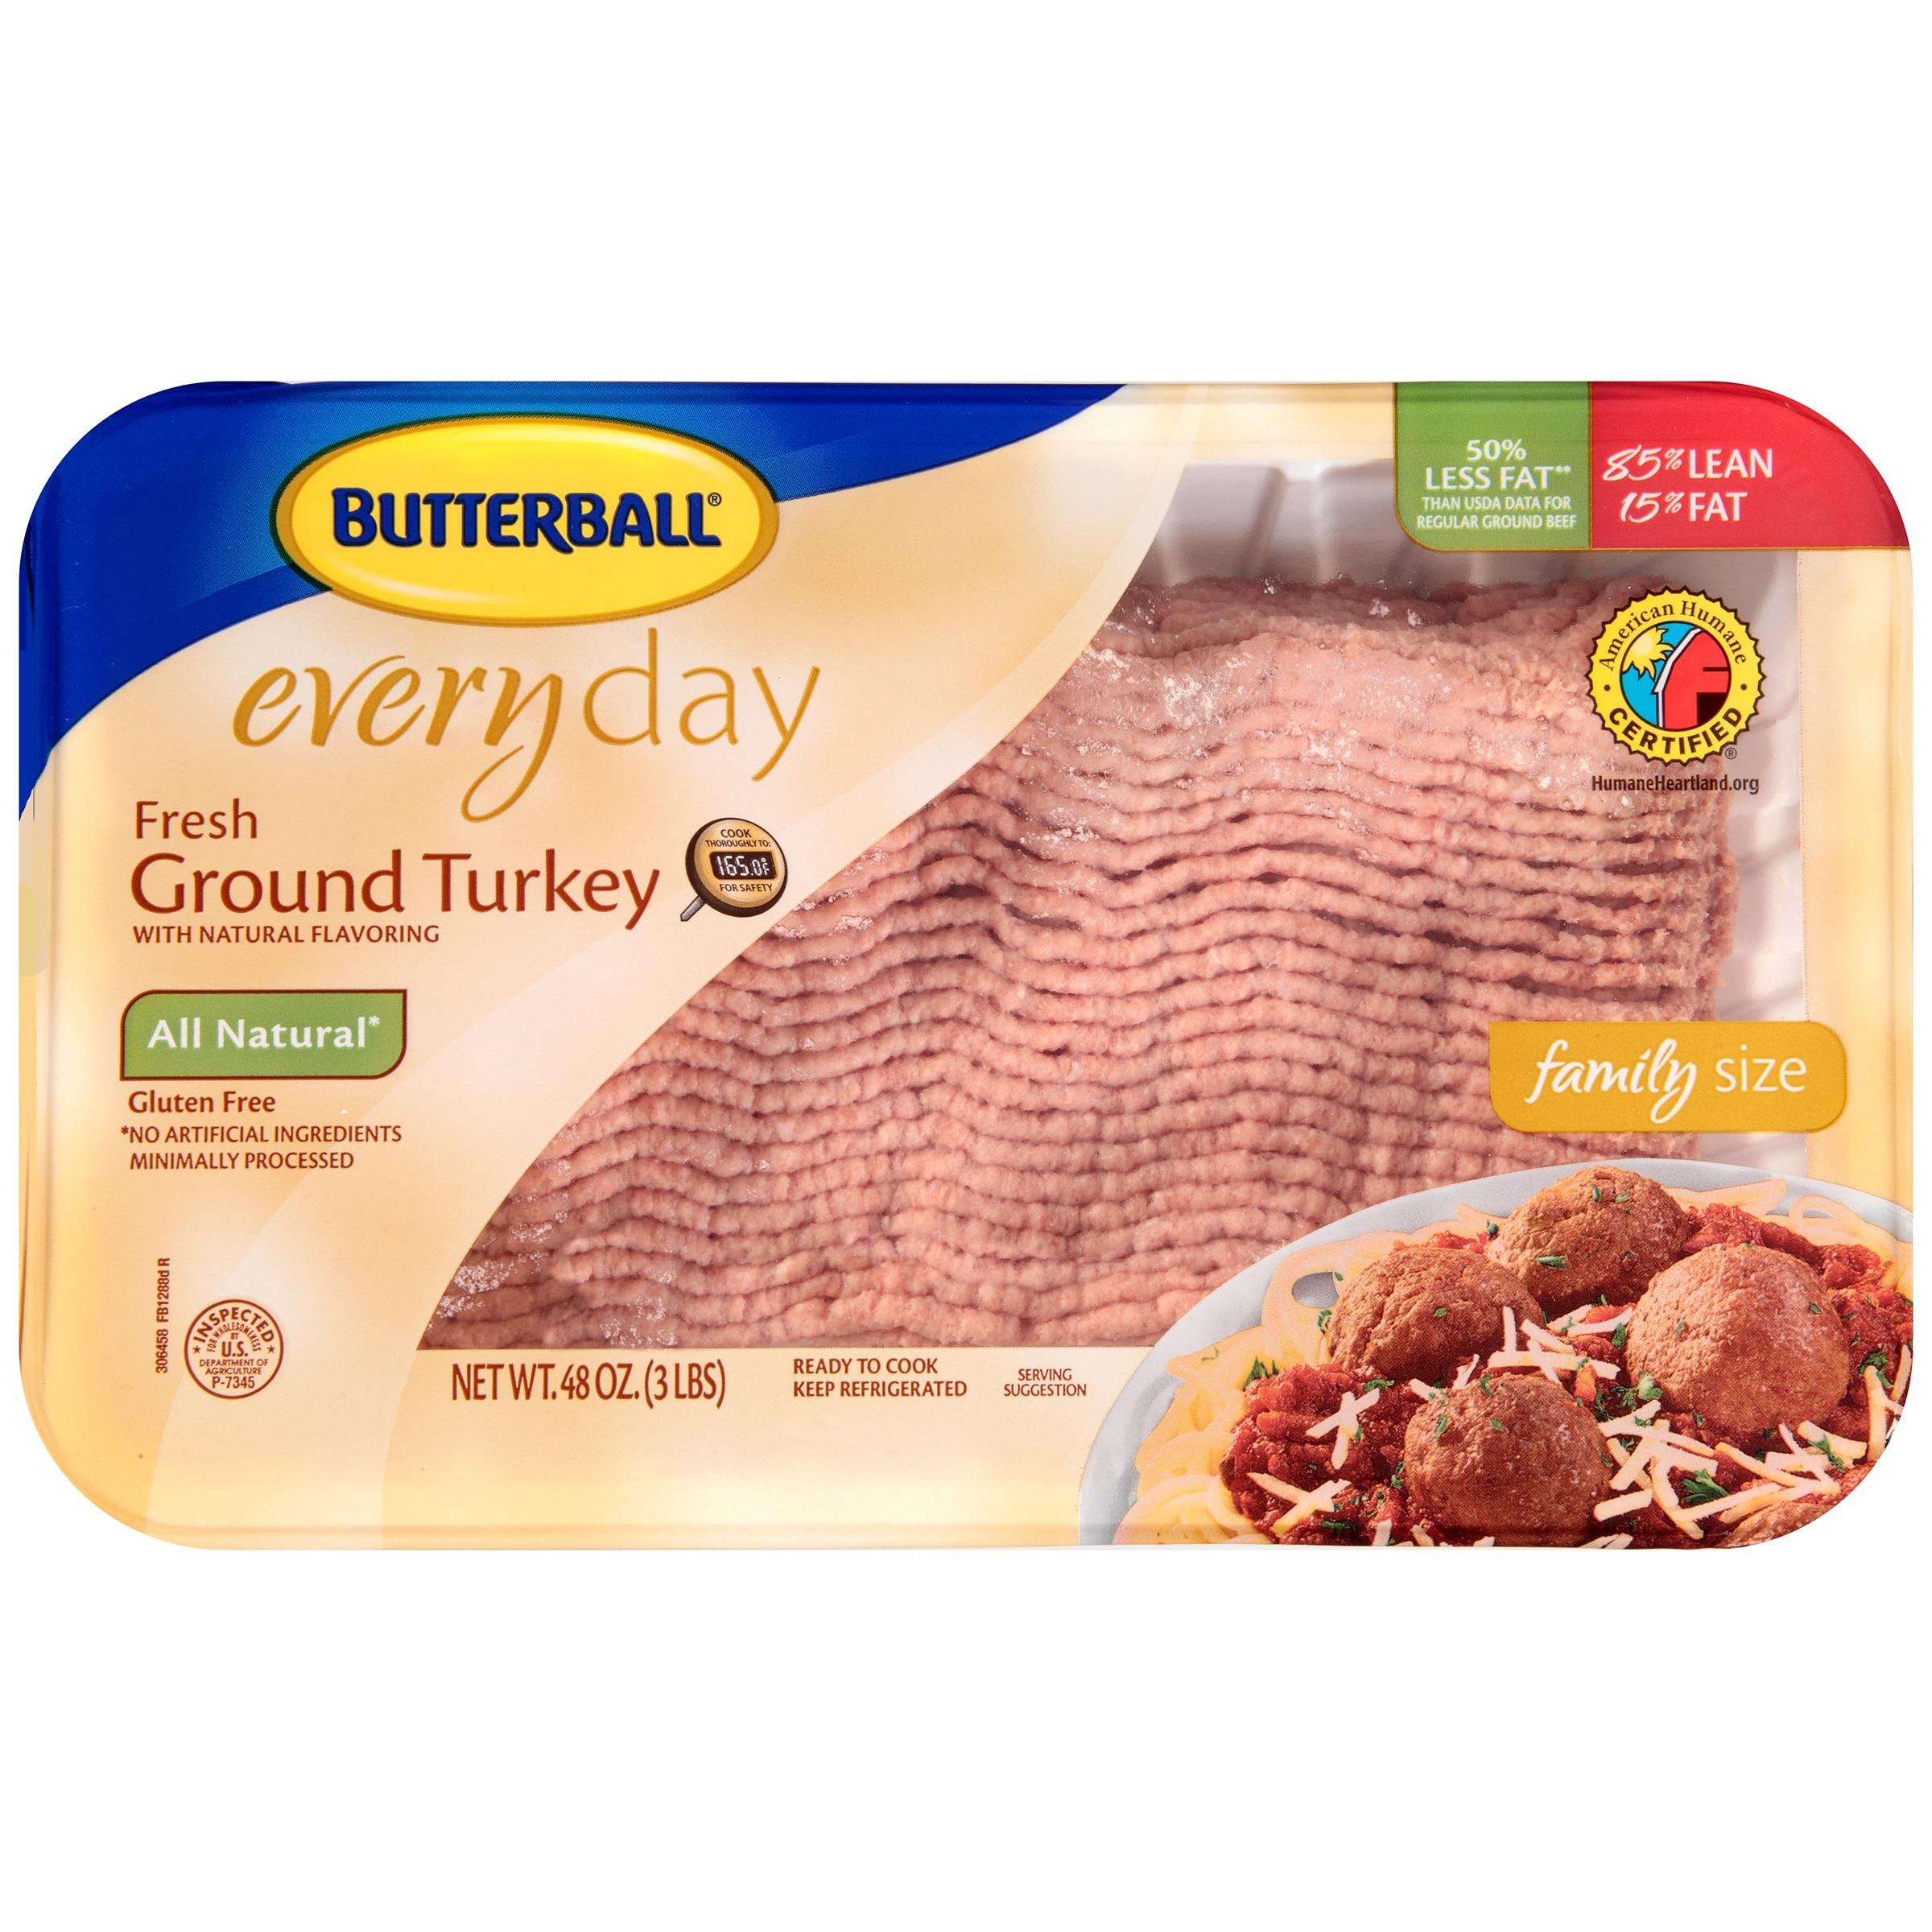 Butterball 85% Lean/15% Fat Fresh Ground Turkey, 3.0 lb